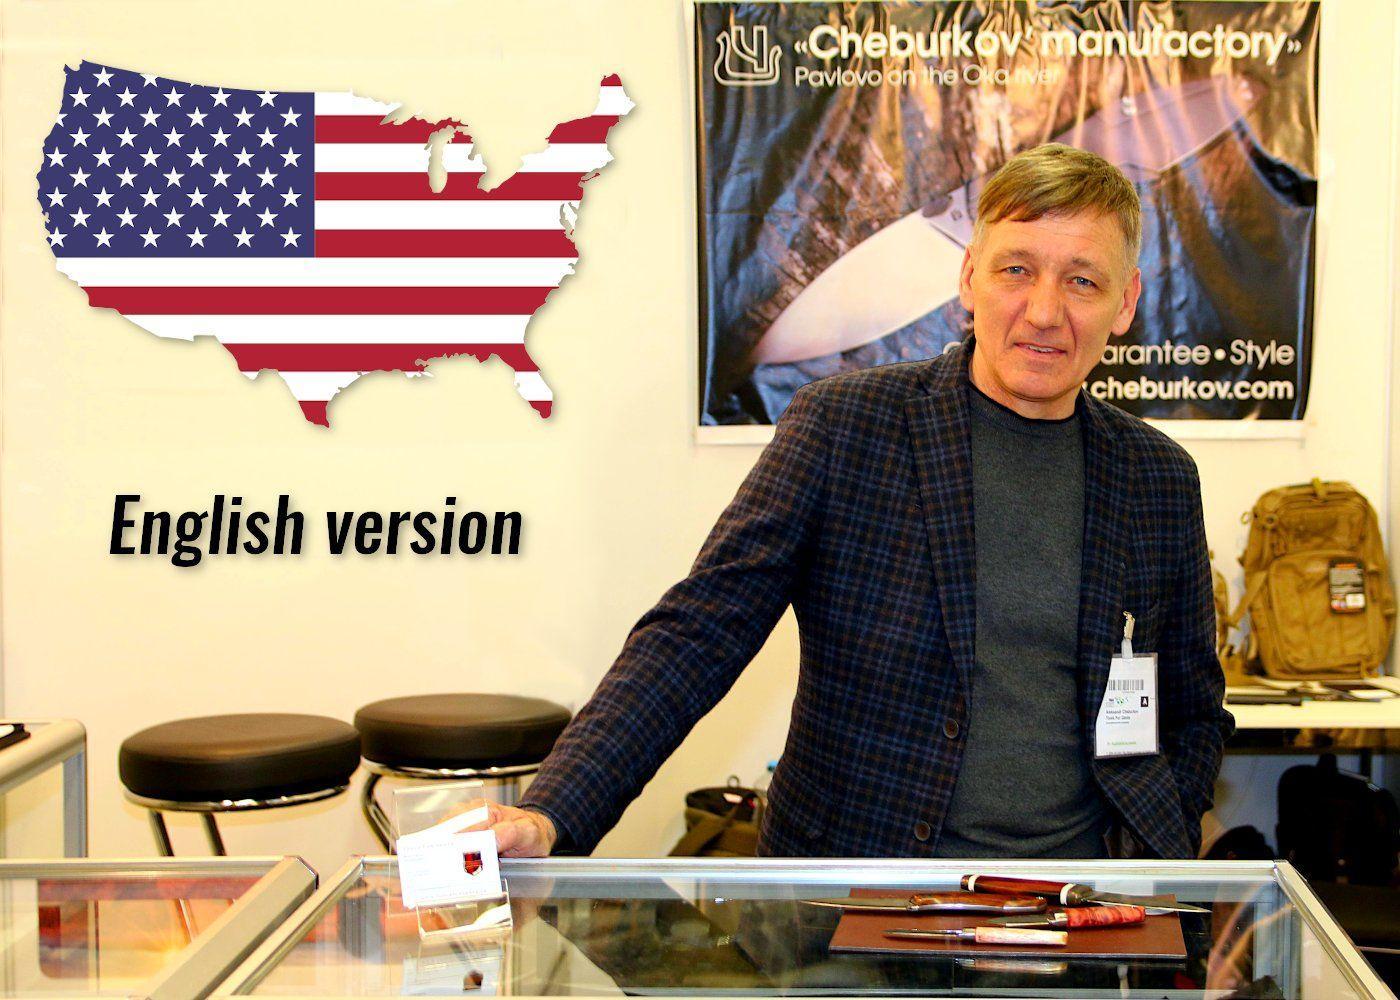 Talkting with Aleksandr Cheburkov